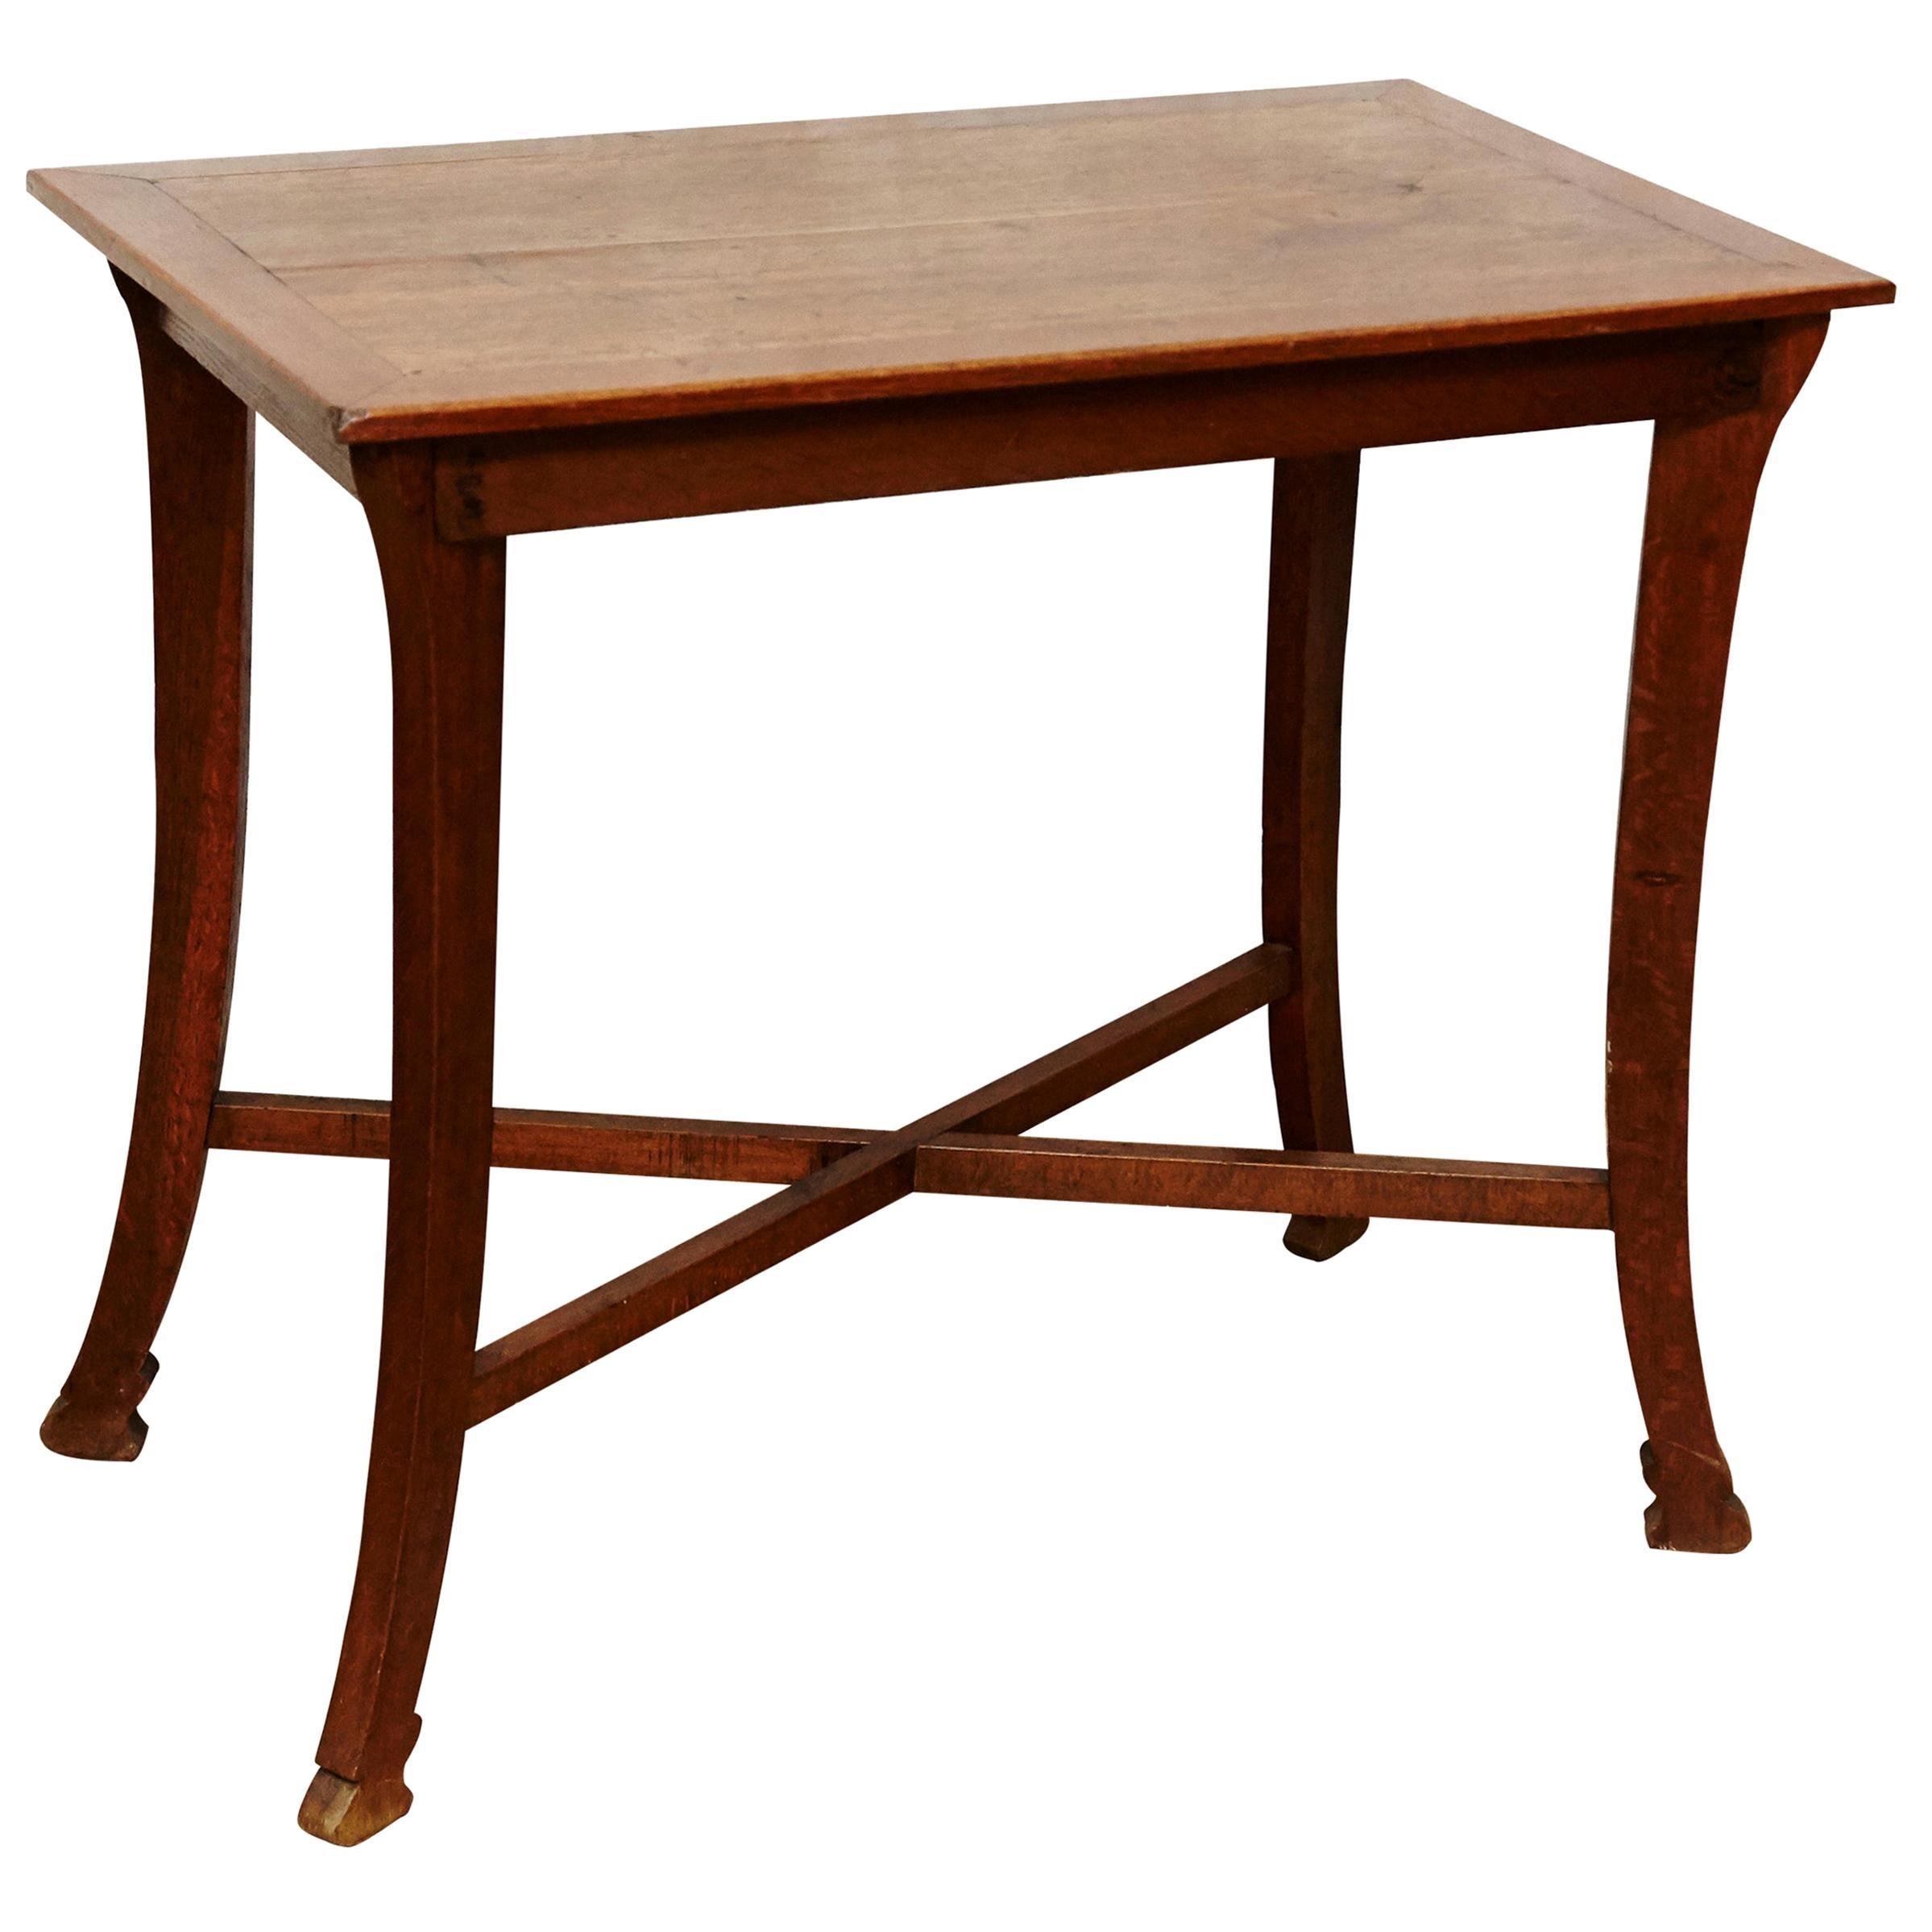 Modernist Oakwood Thonet Table, circa 1930